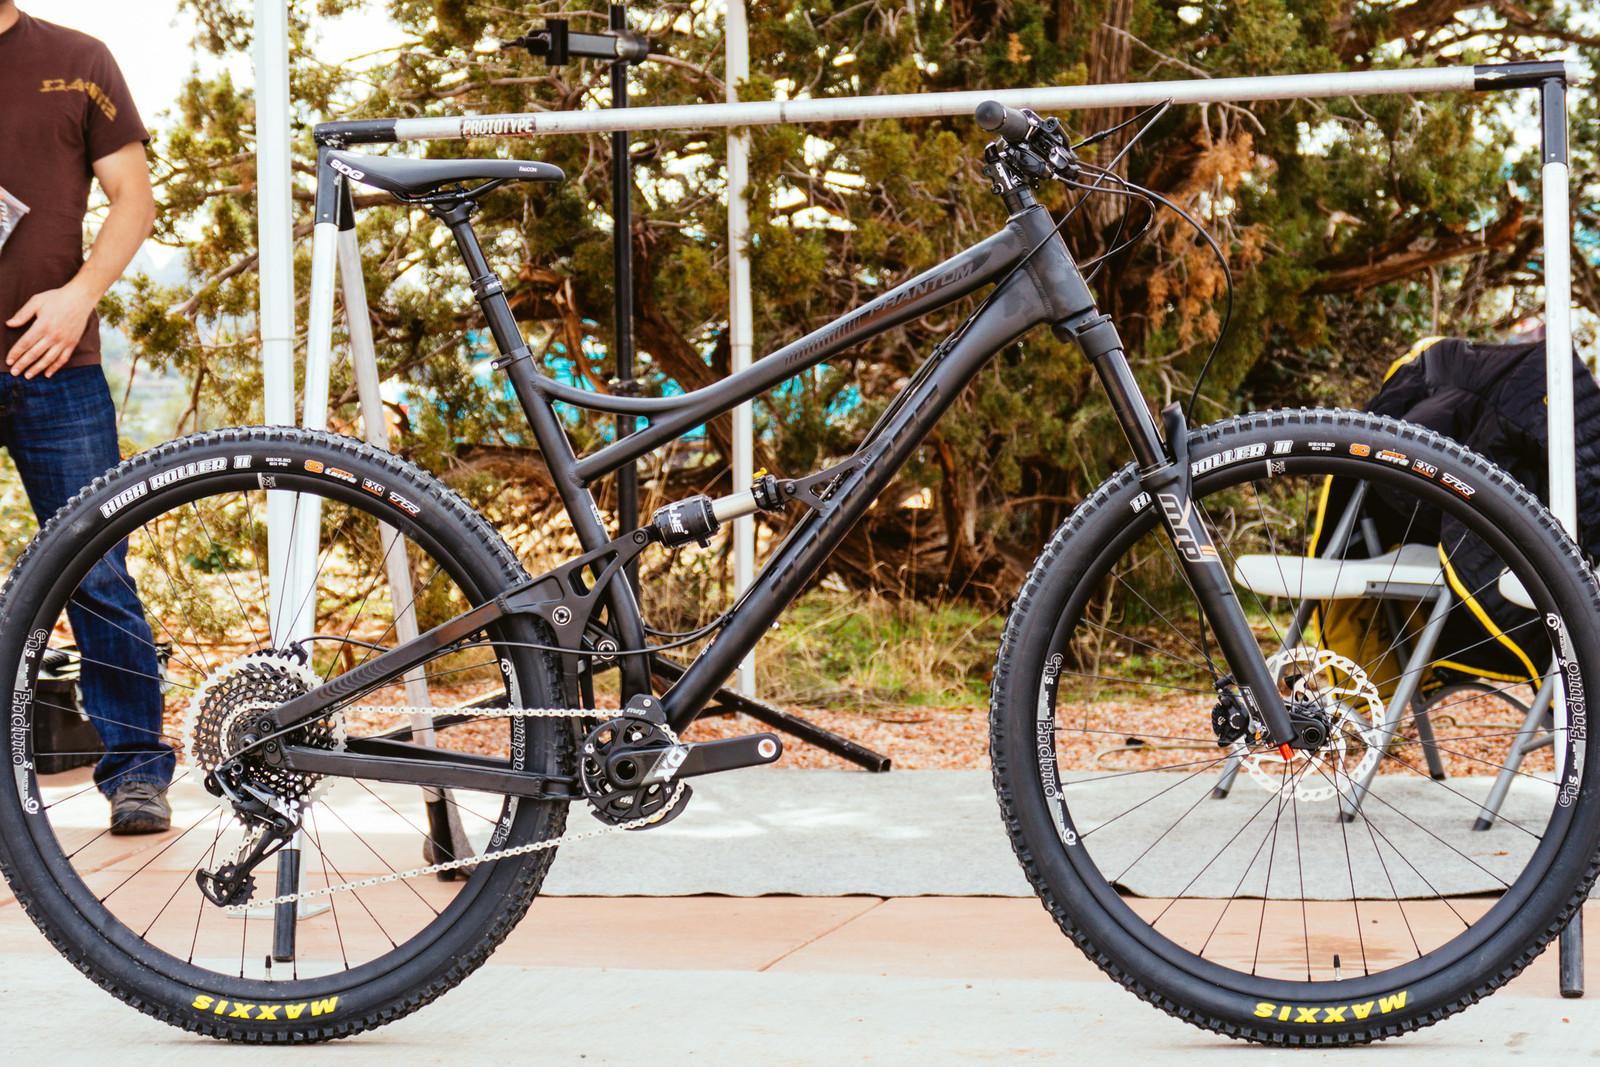 2017 Banshee Phantom - PIT BITS - Fresh Products from the Sedona Mountain Bike Festival - Mountain Biking Pictures - Vital MTB